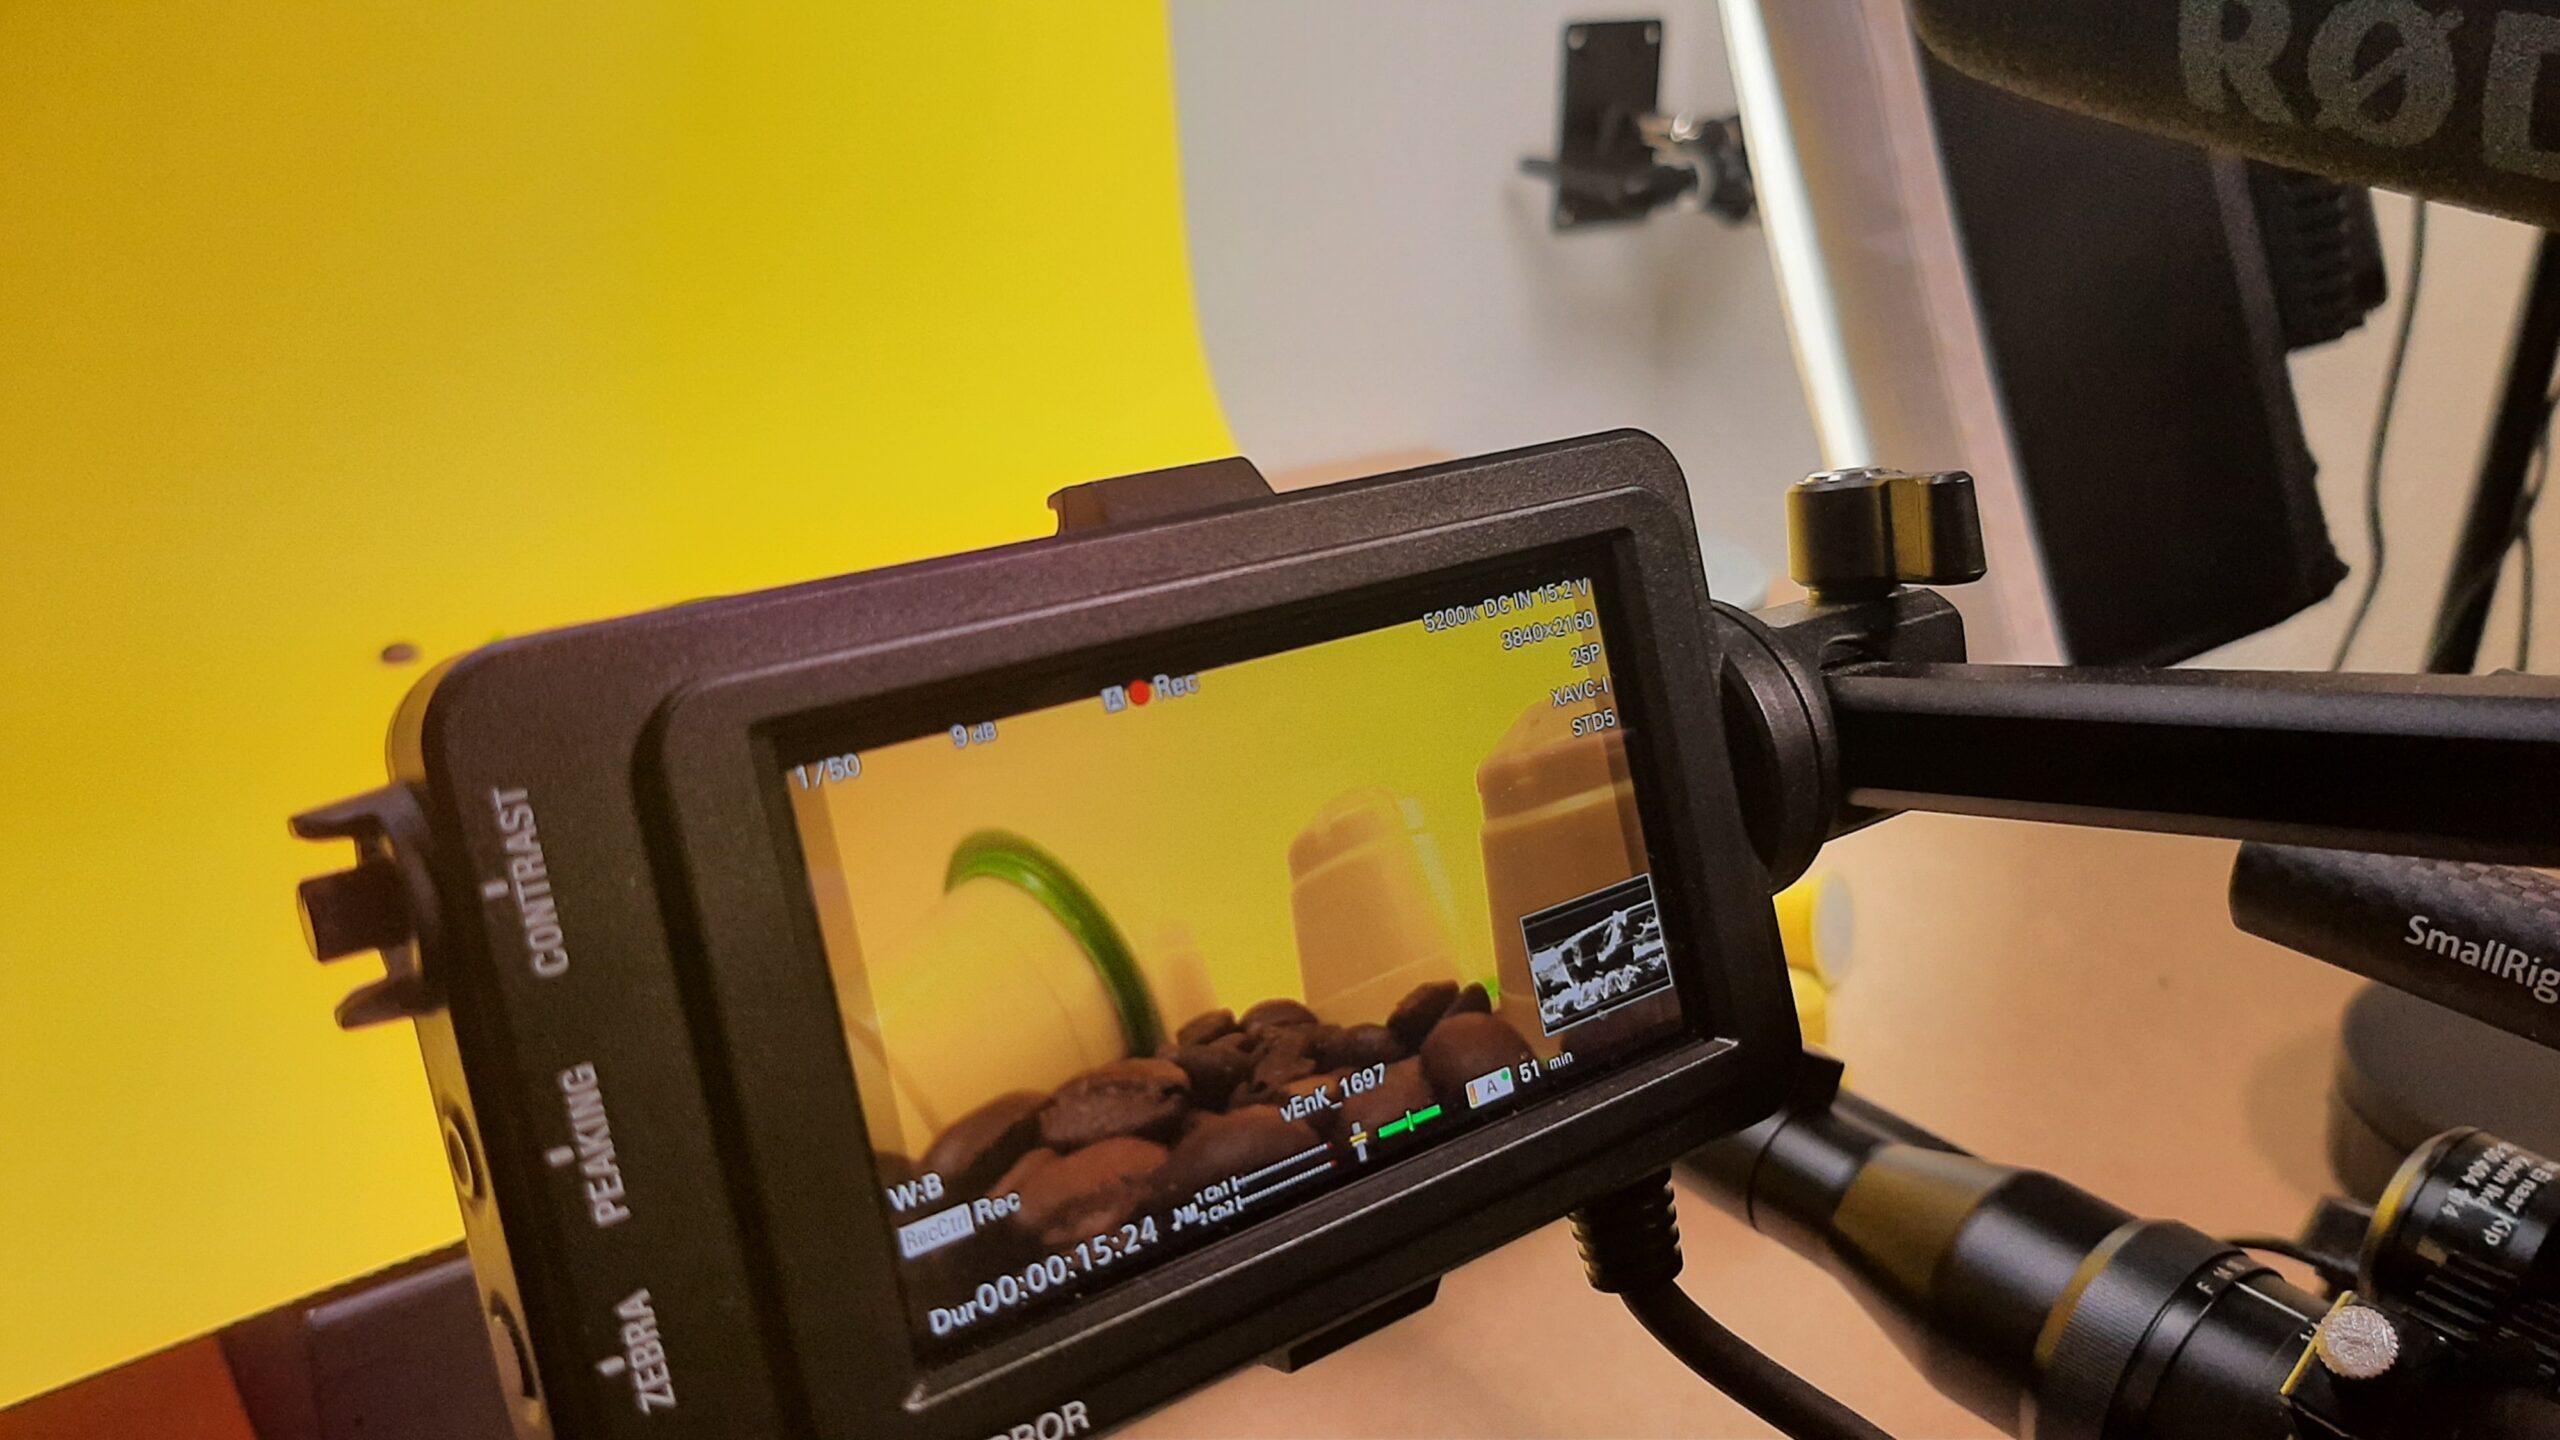 Product video laten maken